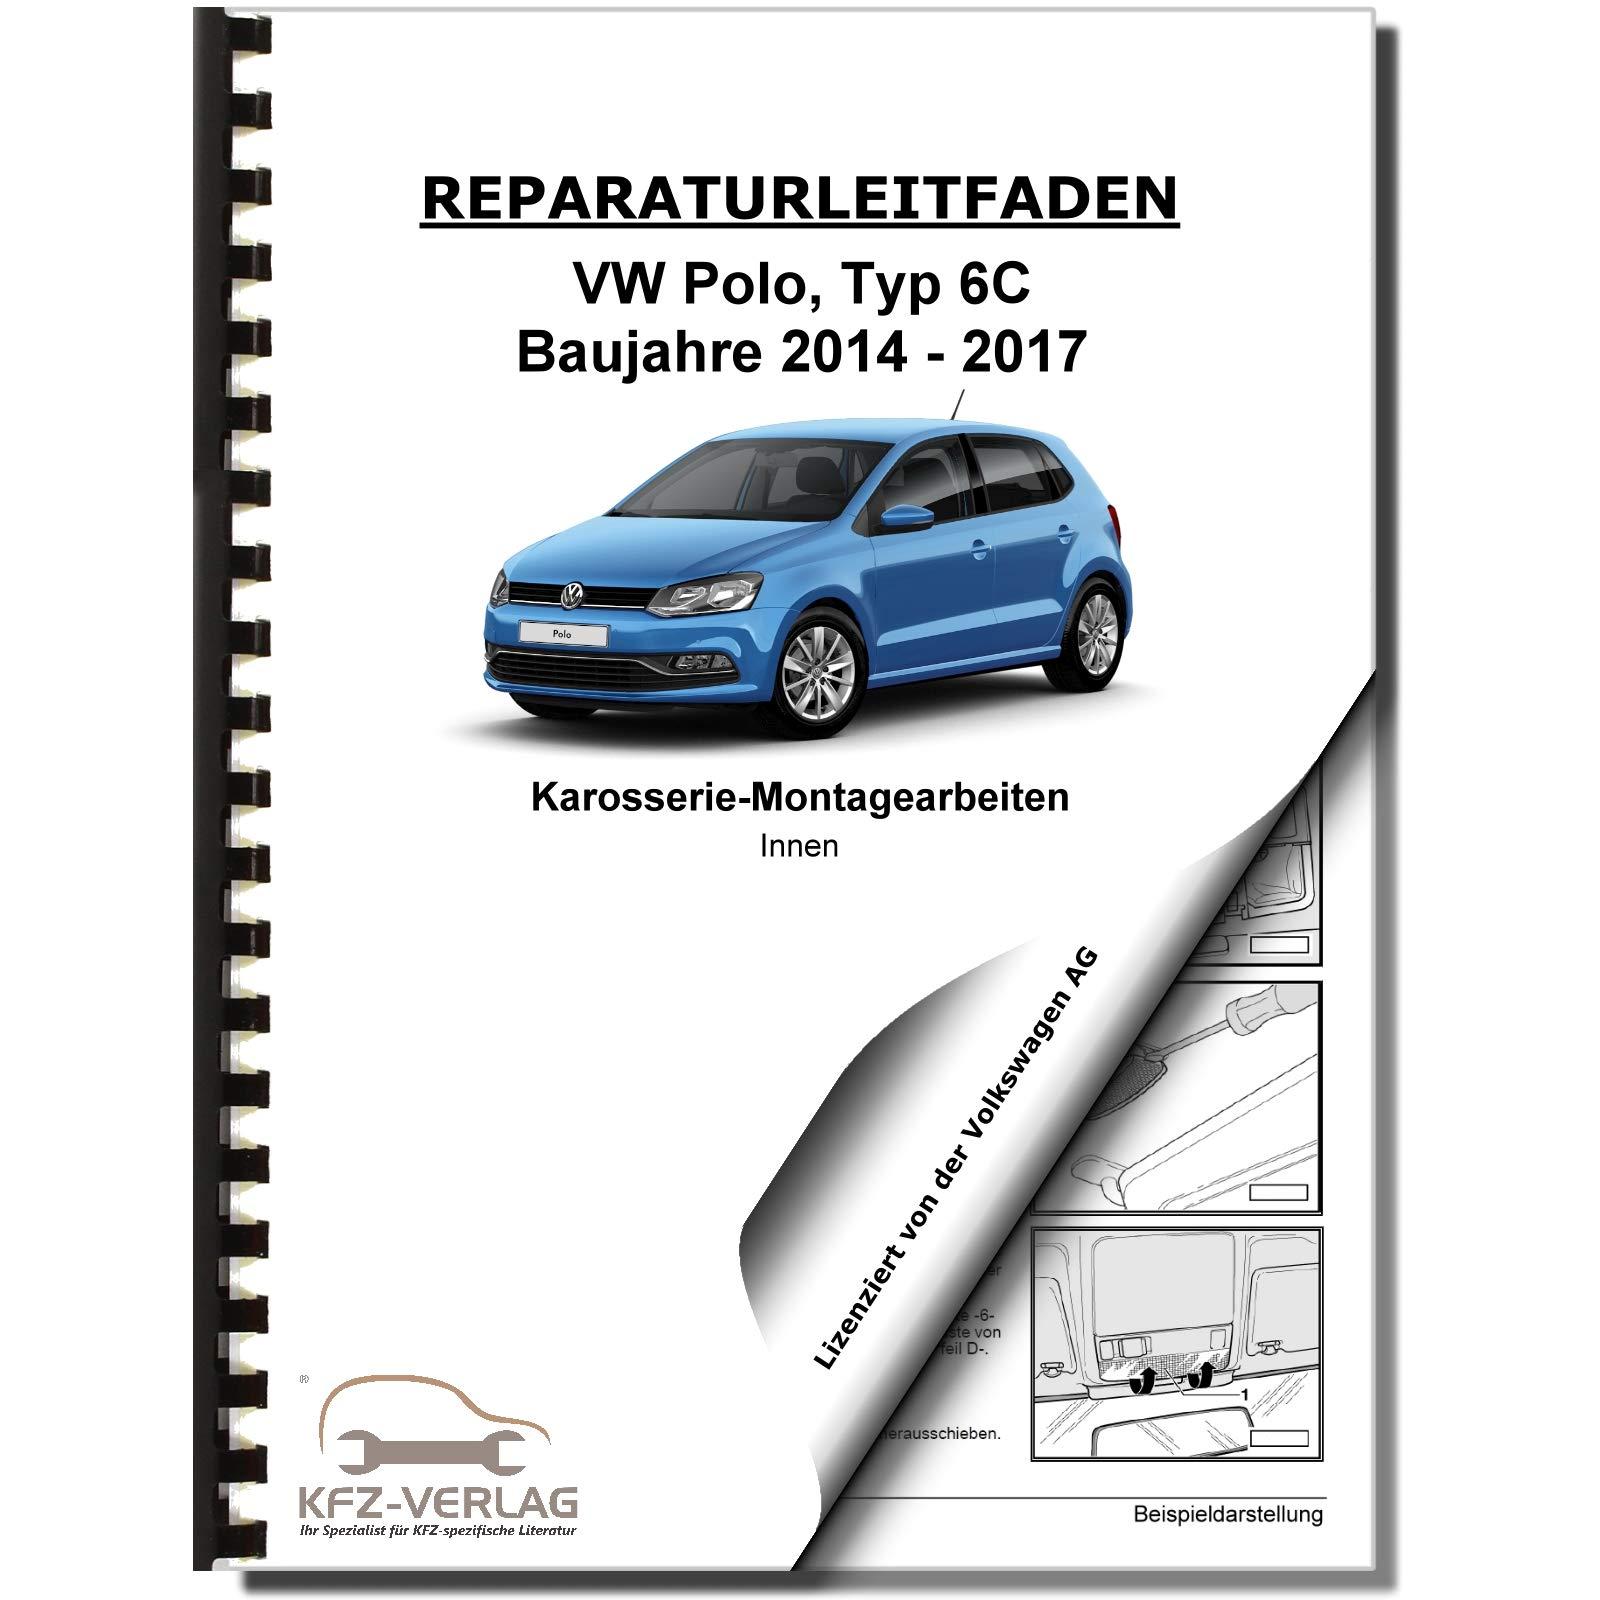 sainchargny.com Auto & Motorrad: Teile Service ...